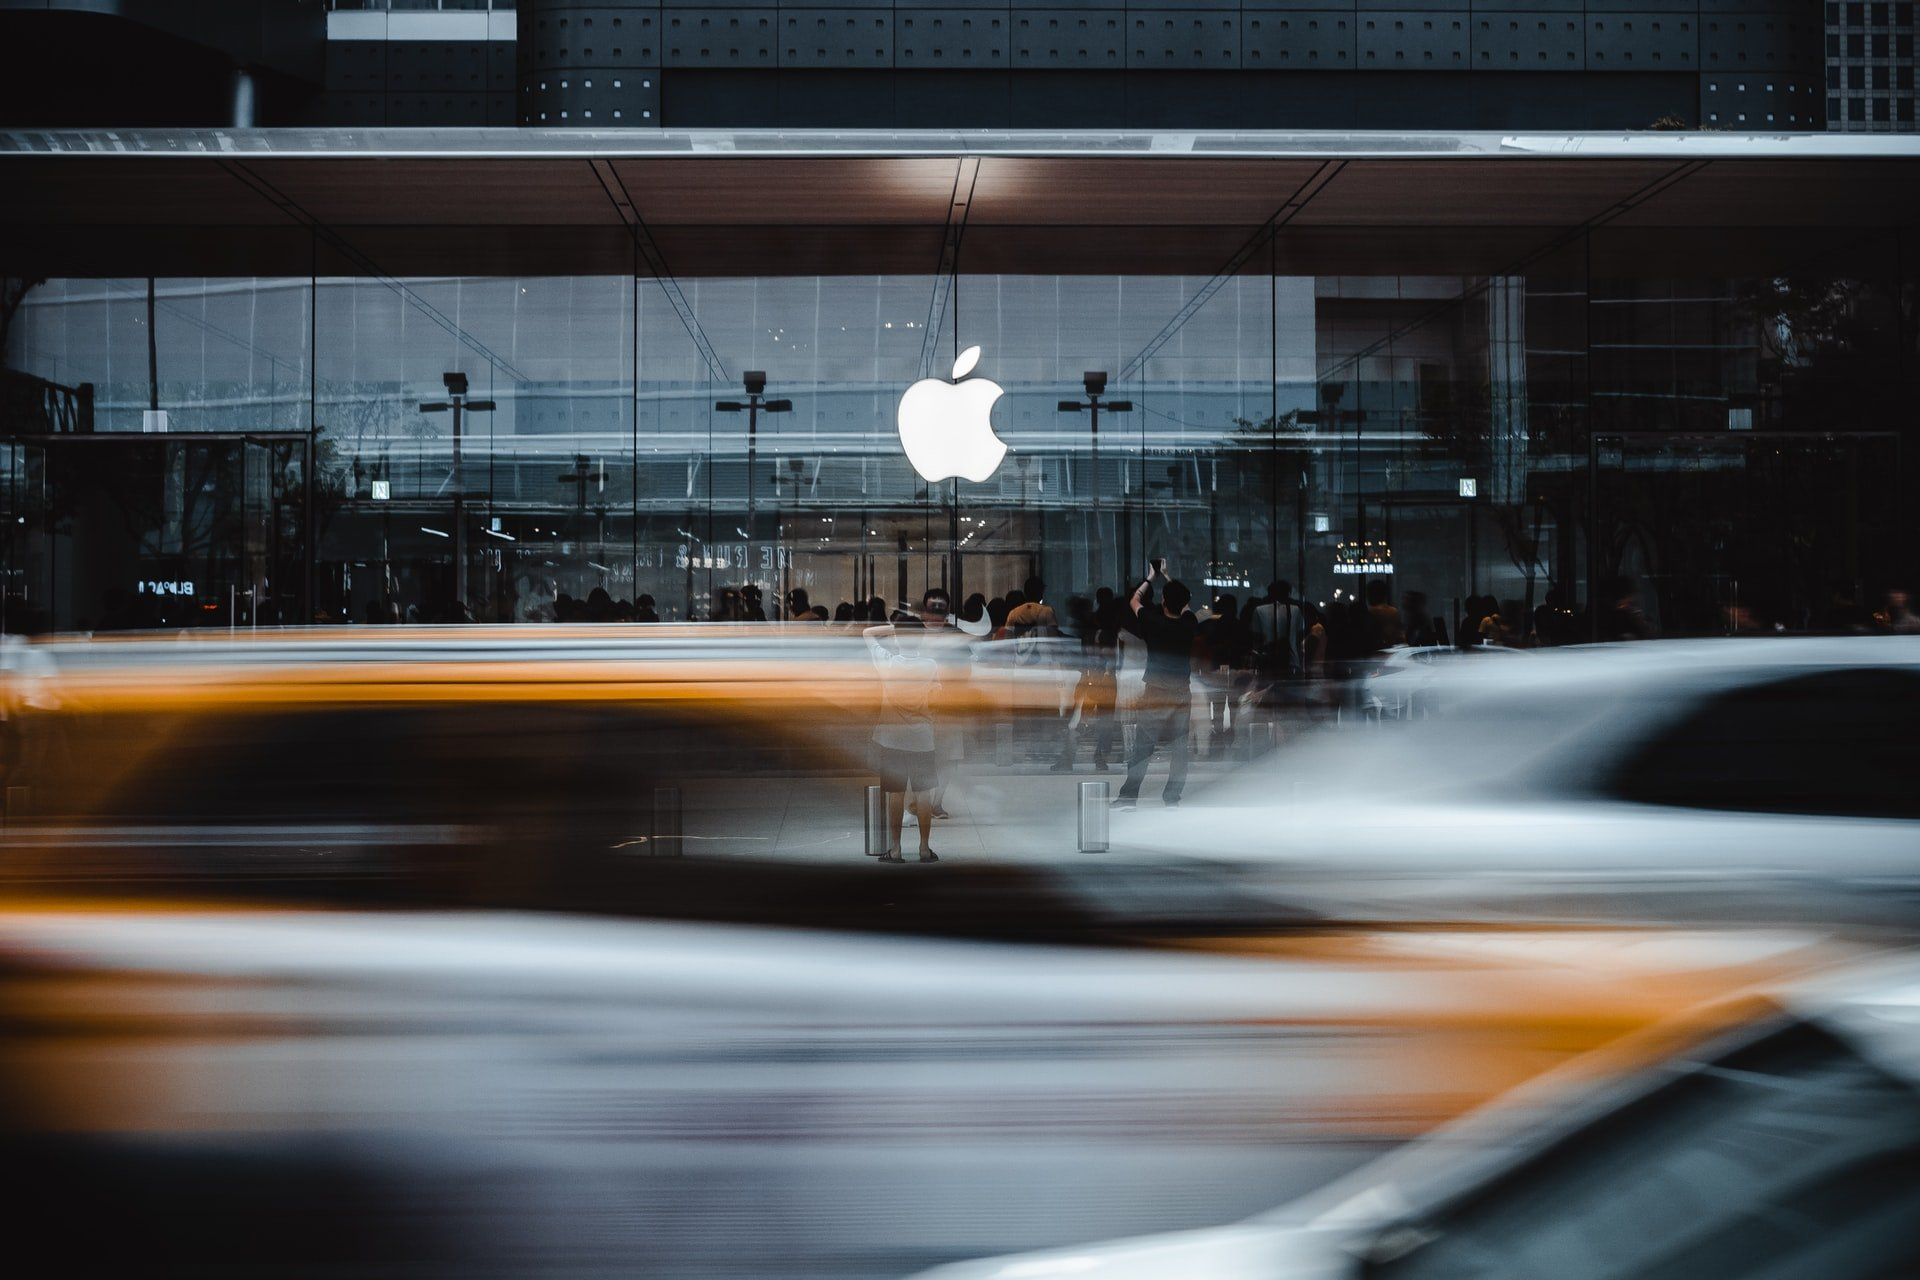 apple-store-car-blur